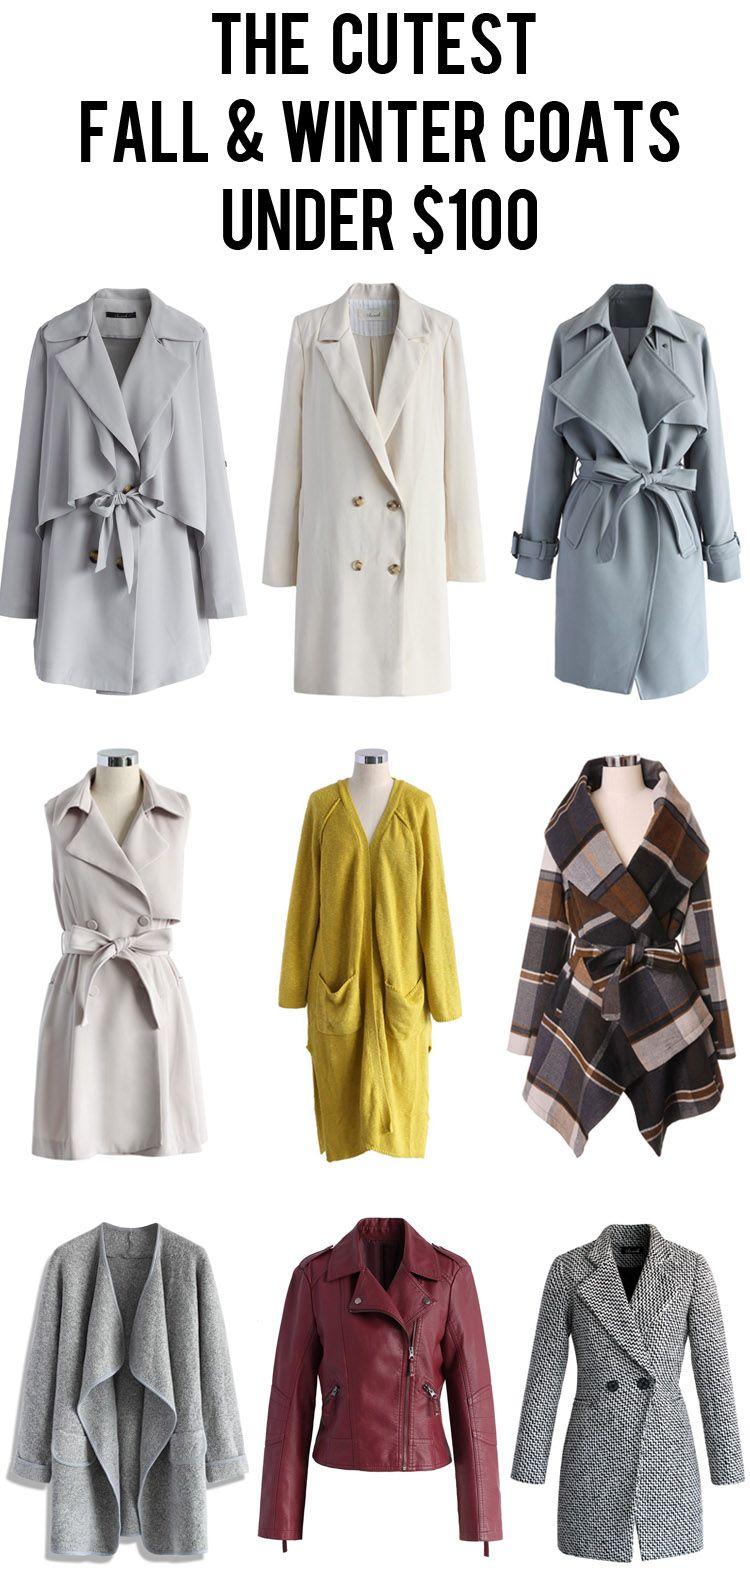 The Cutest Fall And Winter Women Coats Under 100 Fashion Winter Coats Women Clothes [ 1586 x 750 Pixel ]